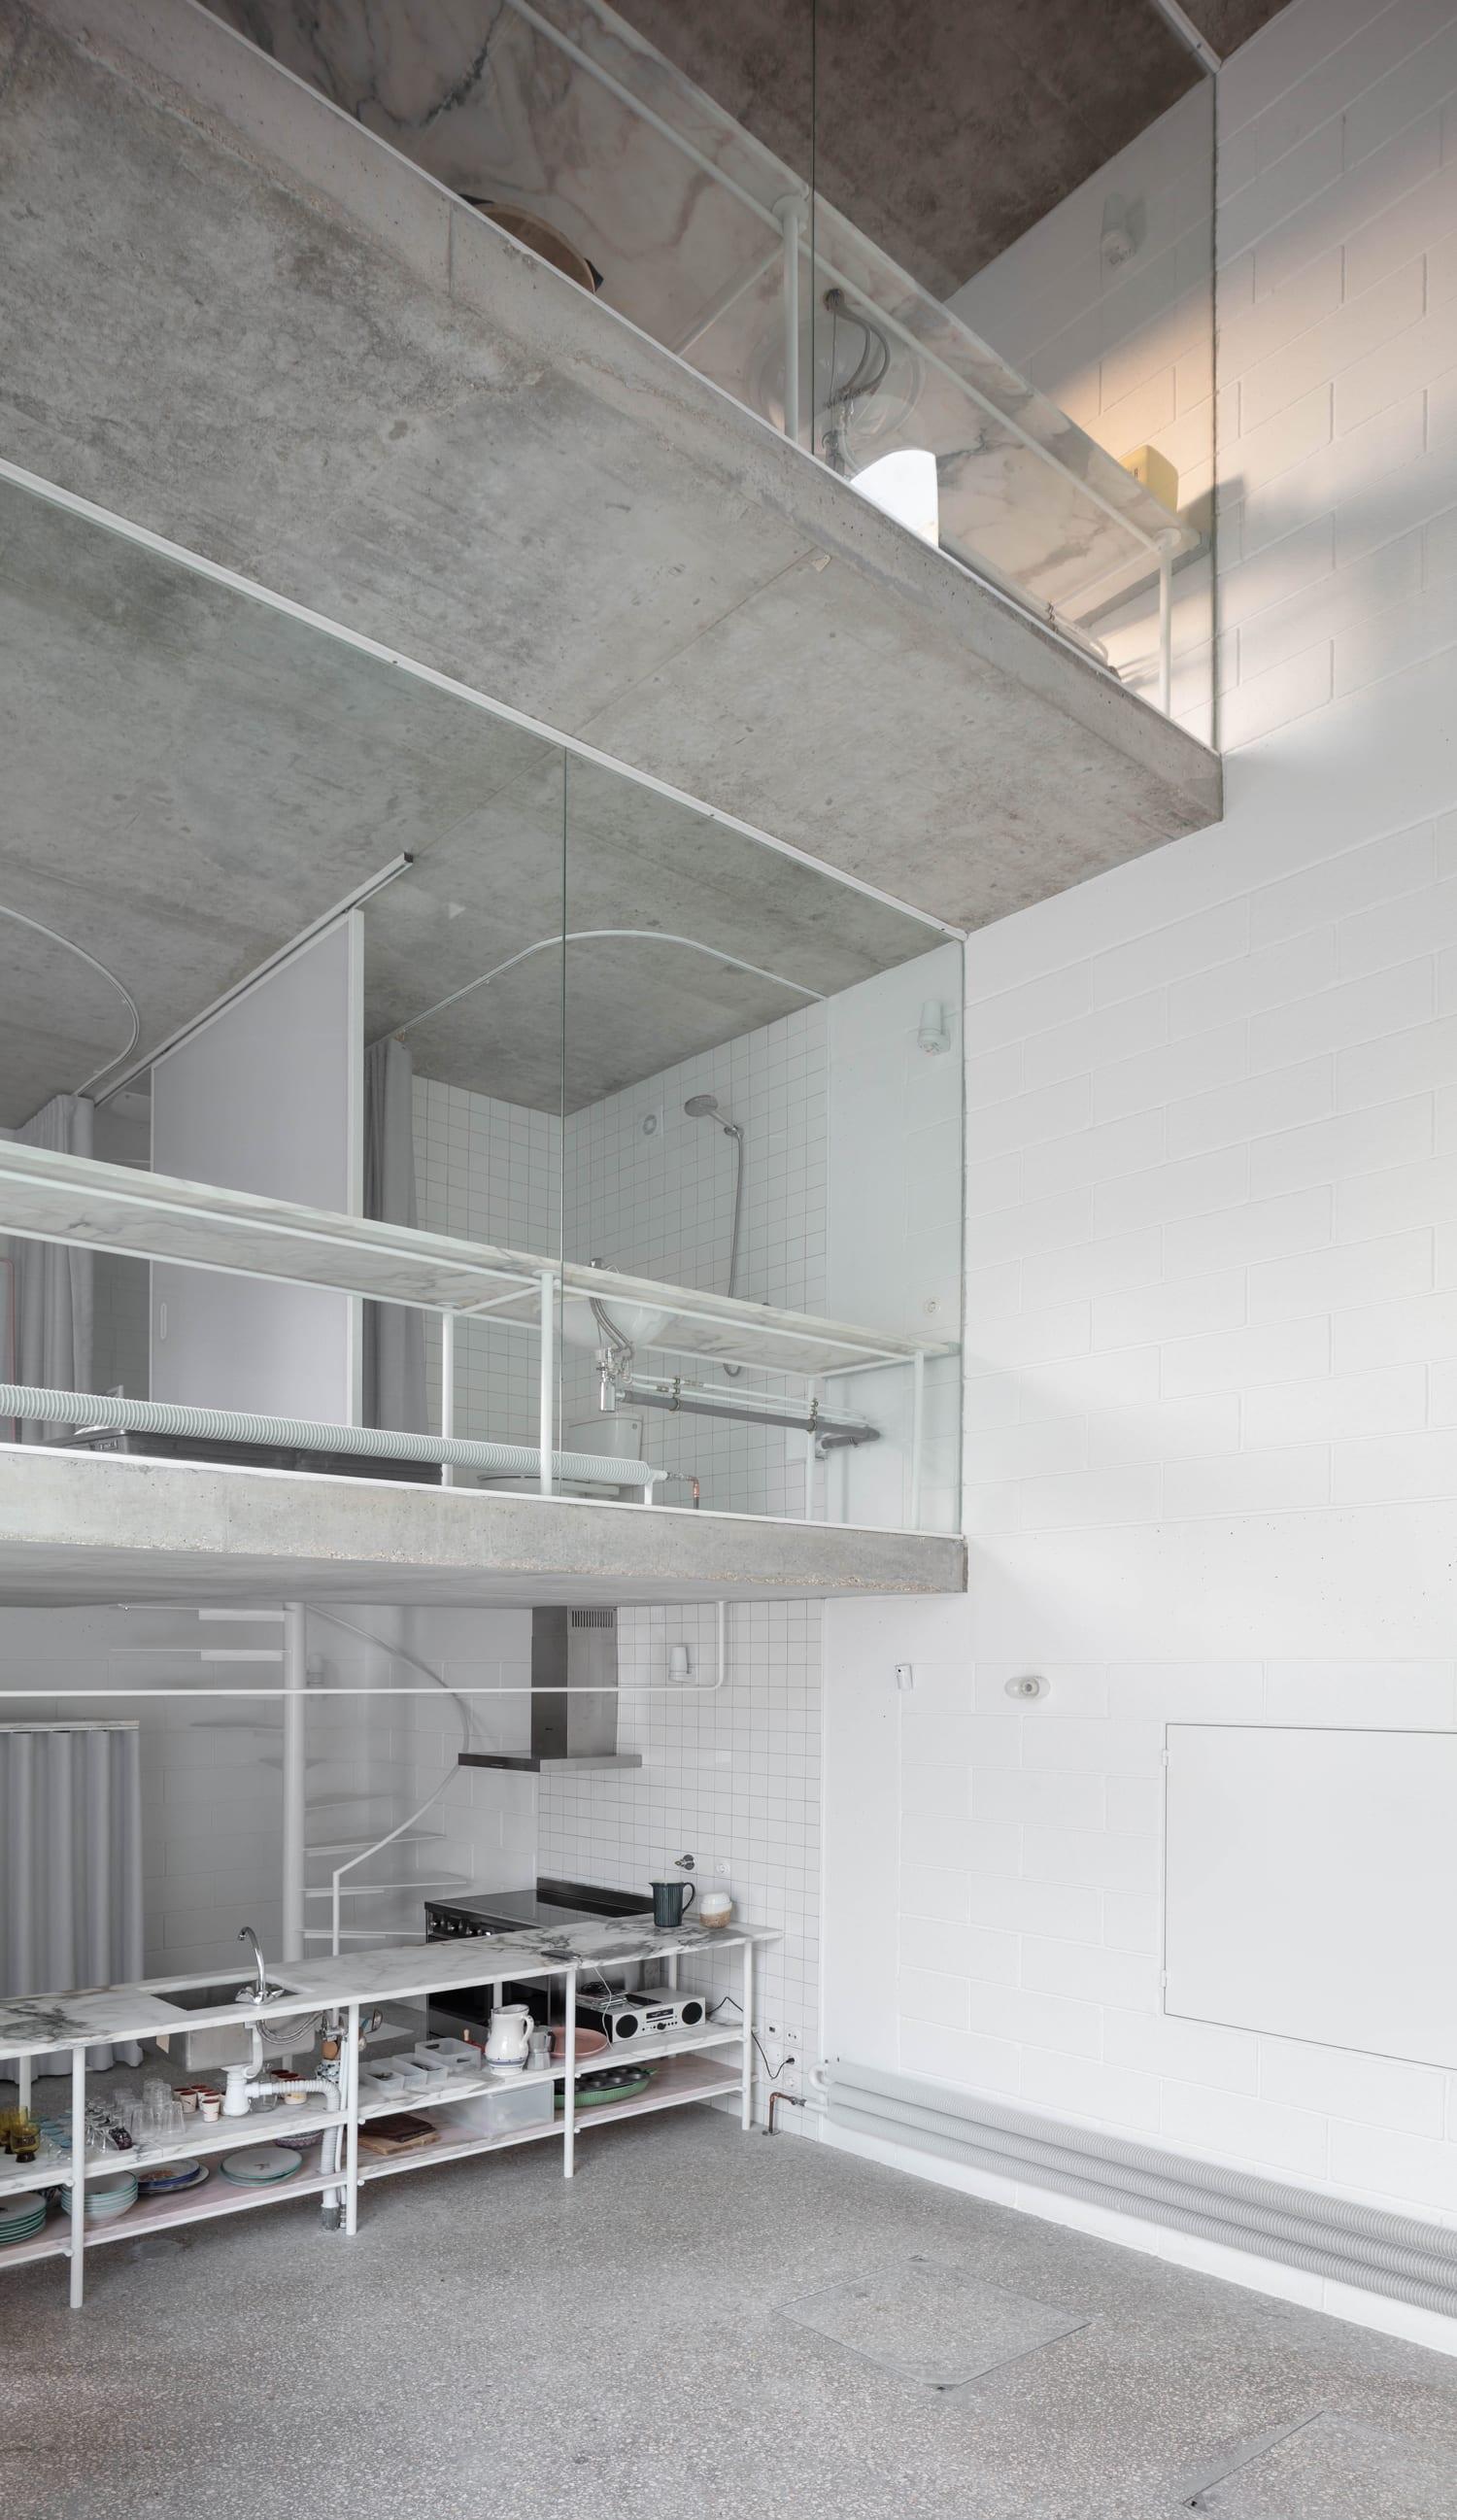 Dodged House In Lisbon By Leopold Banchini Daniel Zamarbide Yellowtrace 08